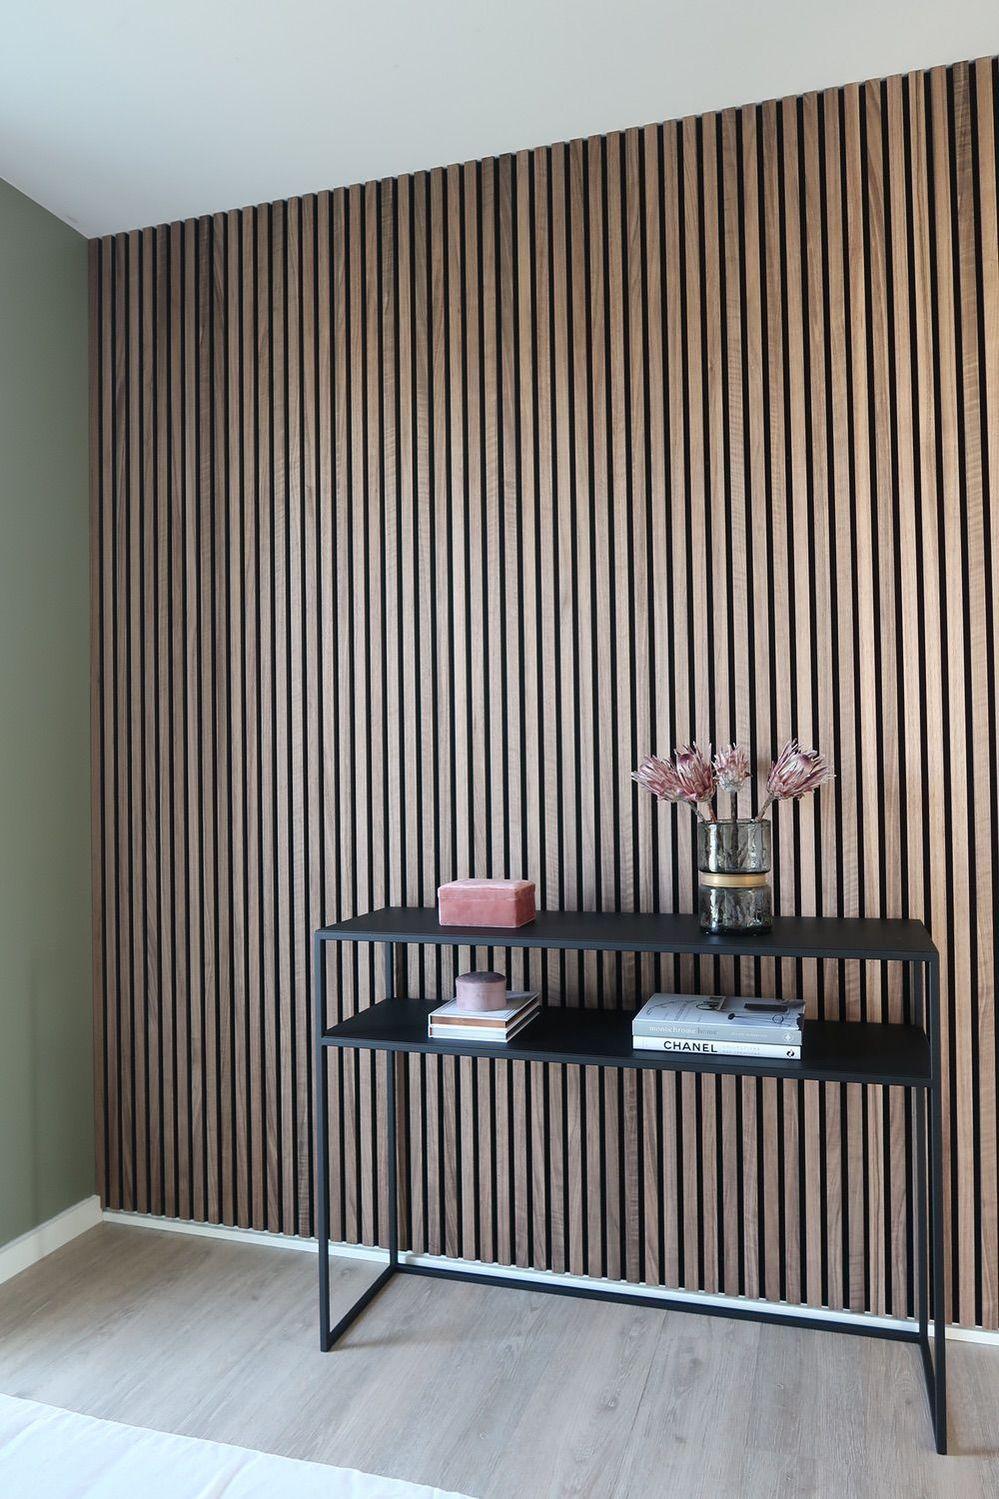 Acupanel Natural Walnut Acoustic Slat Wood Panels for Wall ...